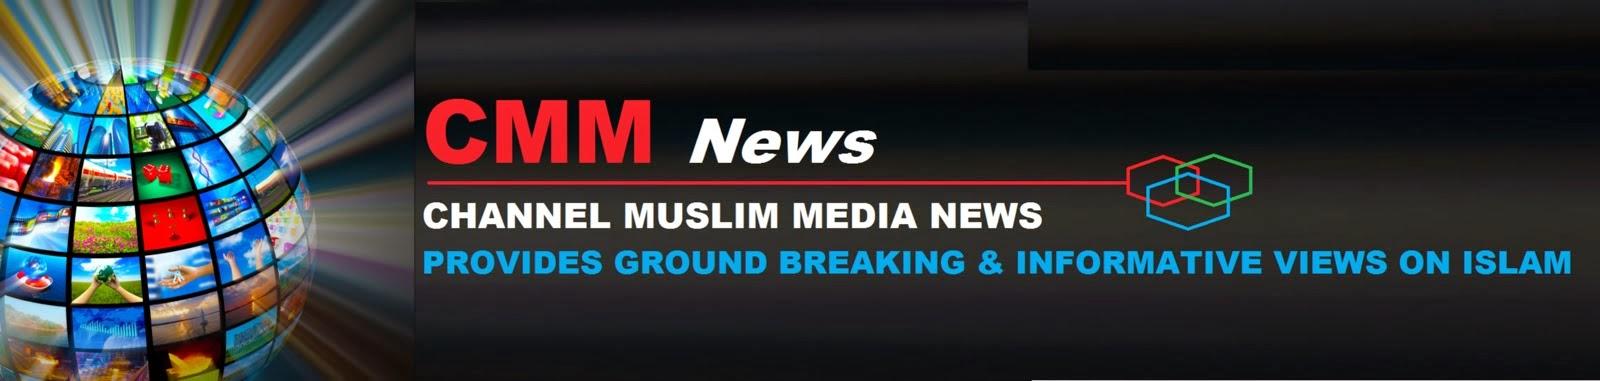 Channel Muslim Media